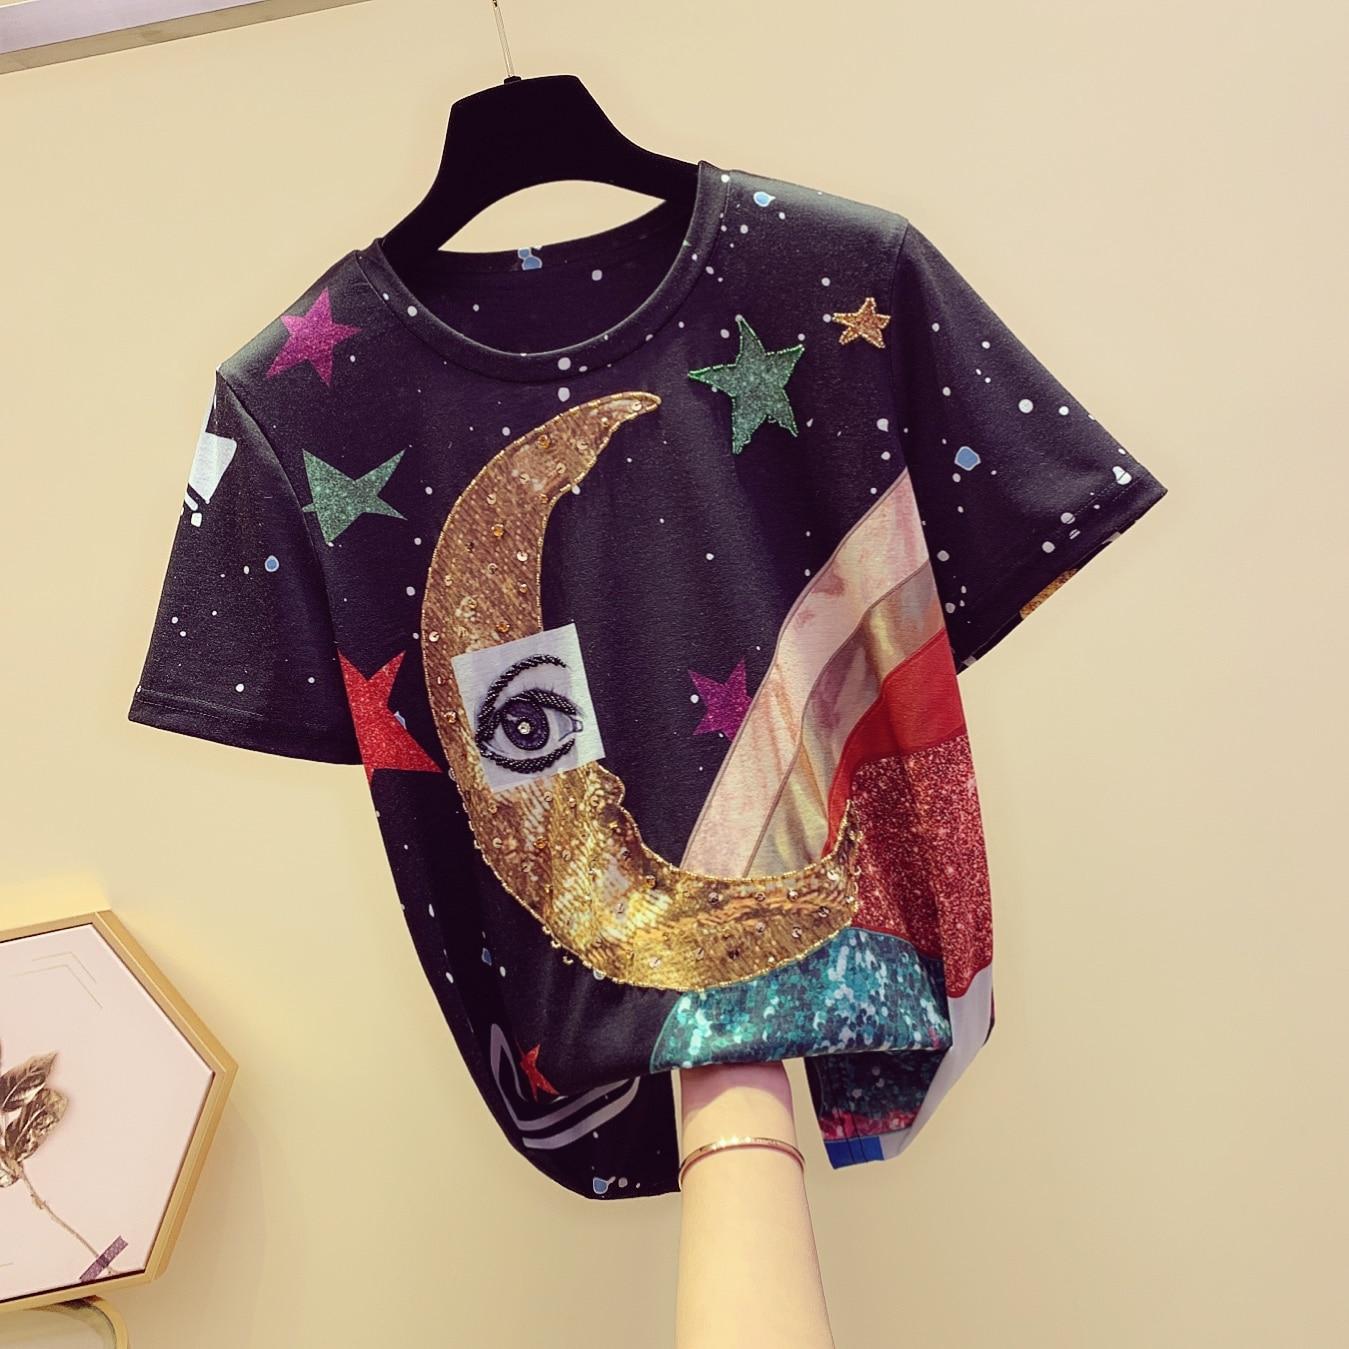 Spring Summer Short Sleeve Tee Shirt 2019 Korean New Round Collar Star Printing Matchwork Patterns T shirt Tshirt Student Tees